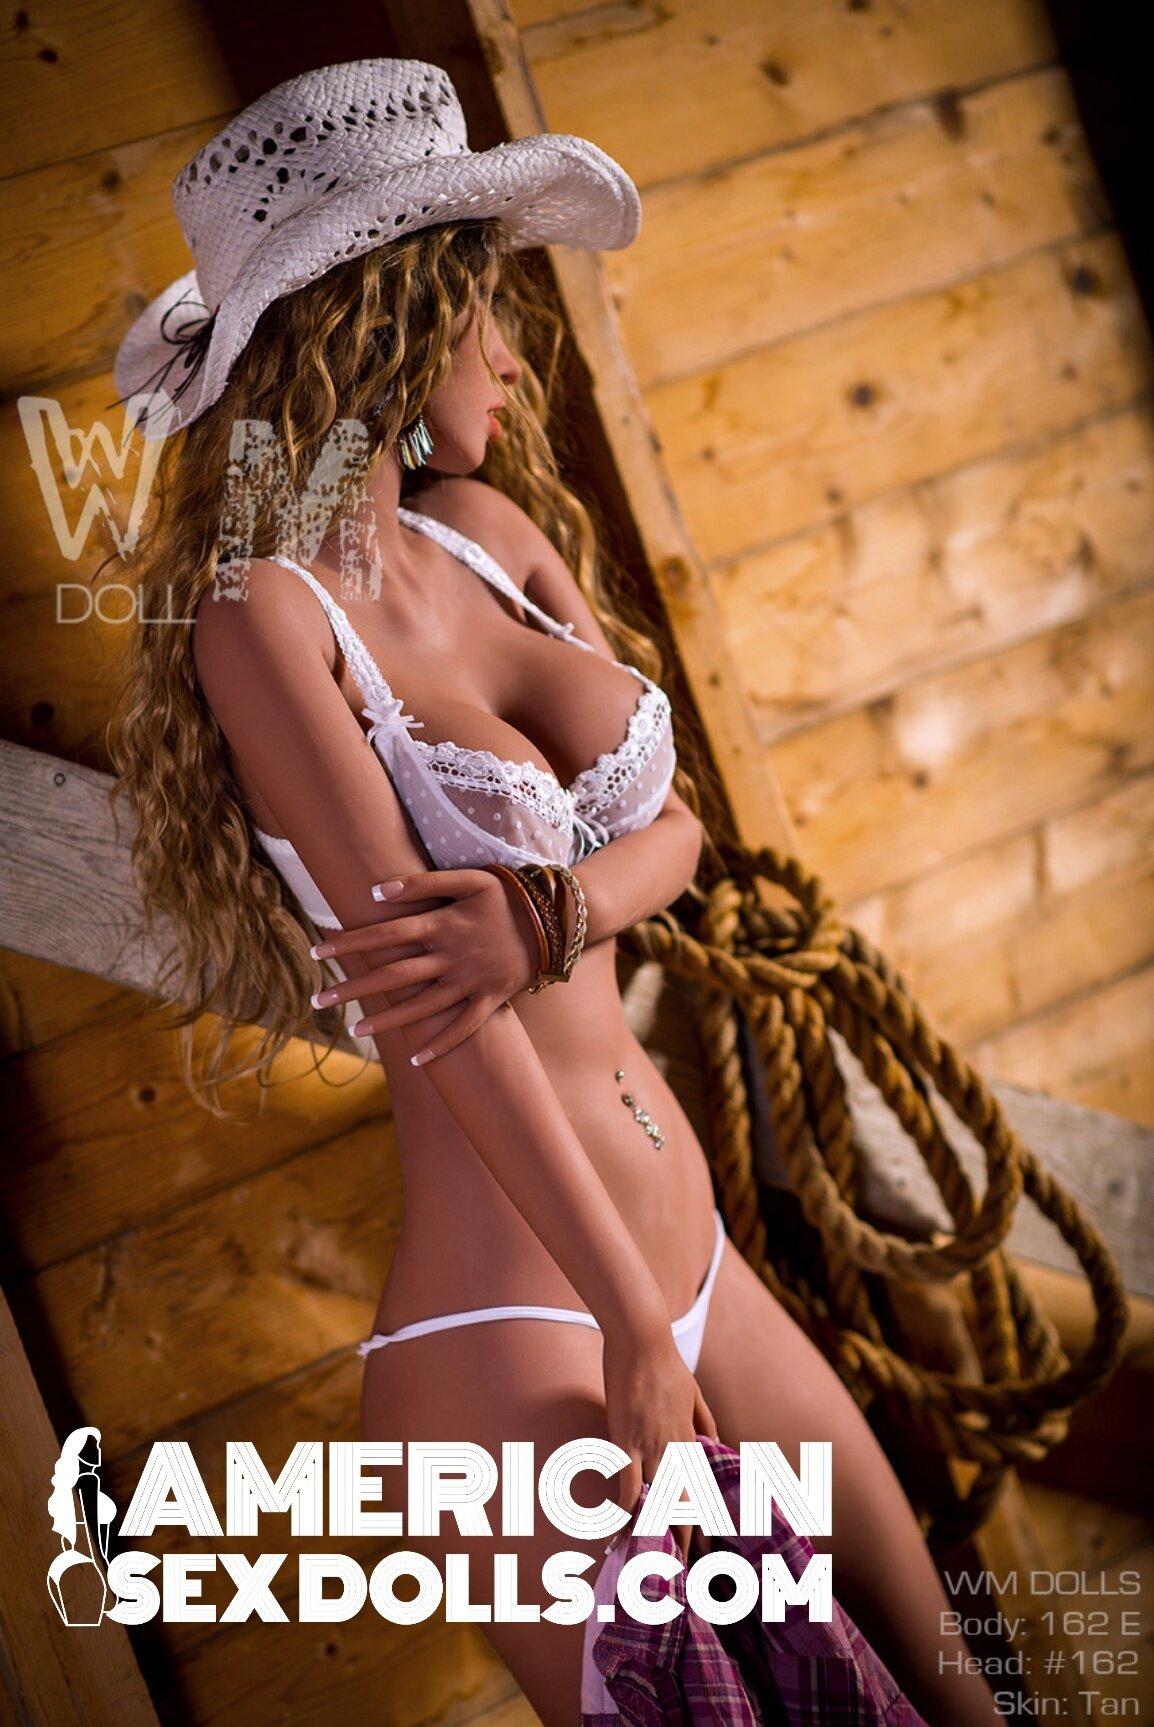 WM Dolls Sex Doll 162cm head 4 (18).jpg